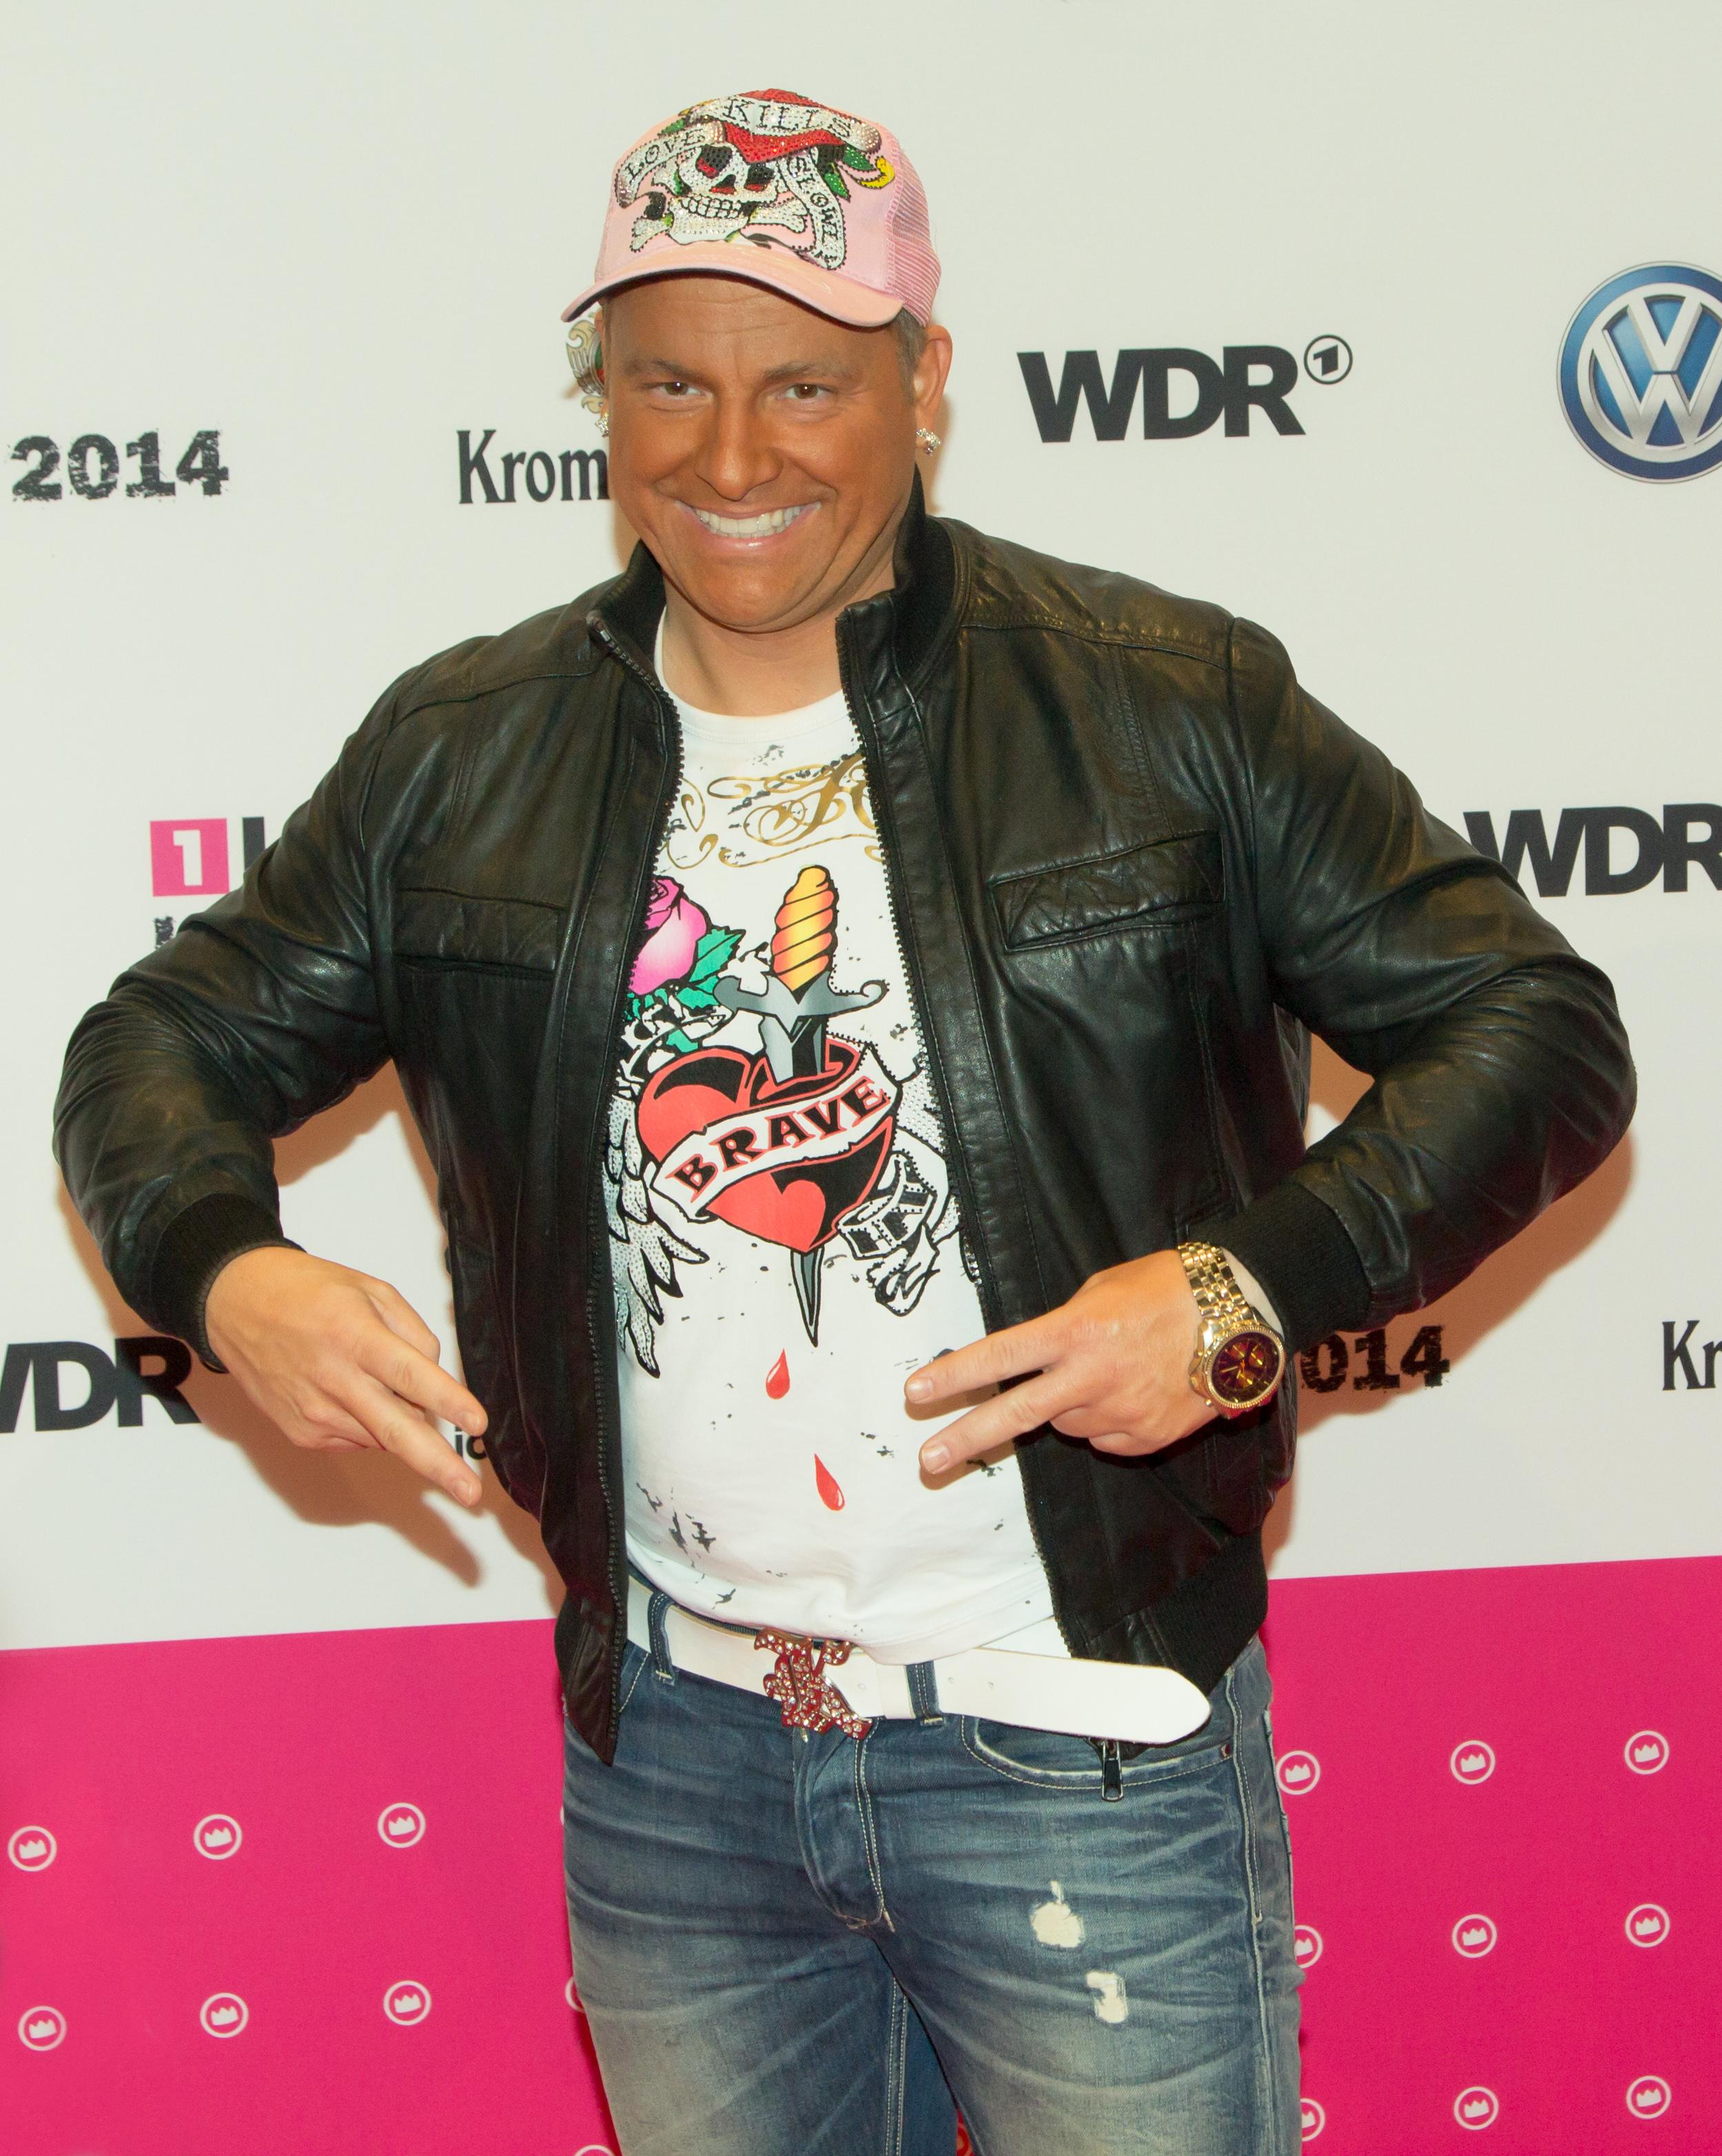 Martin Klempnow Bergretter